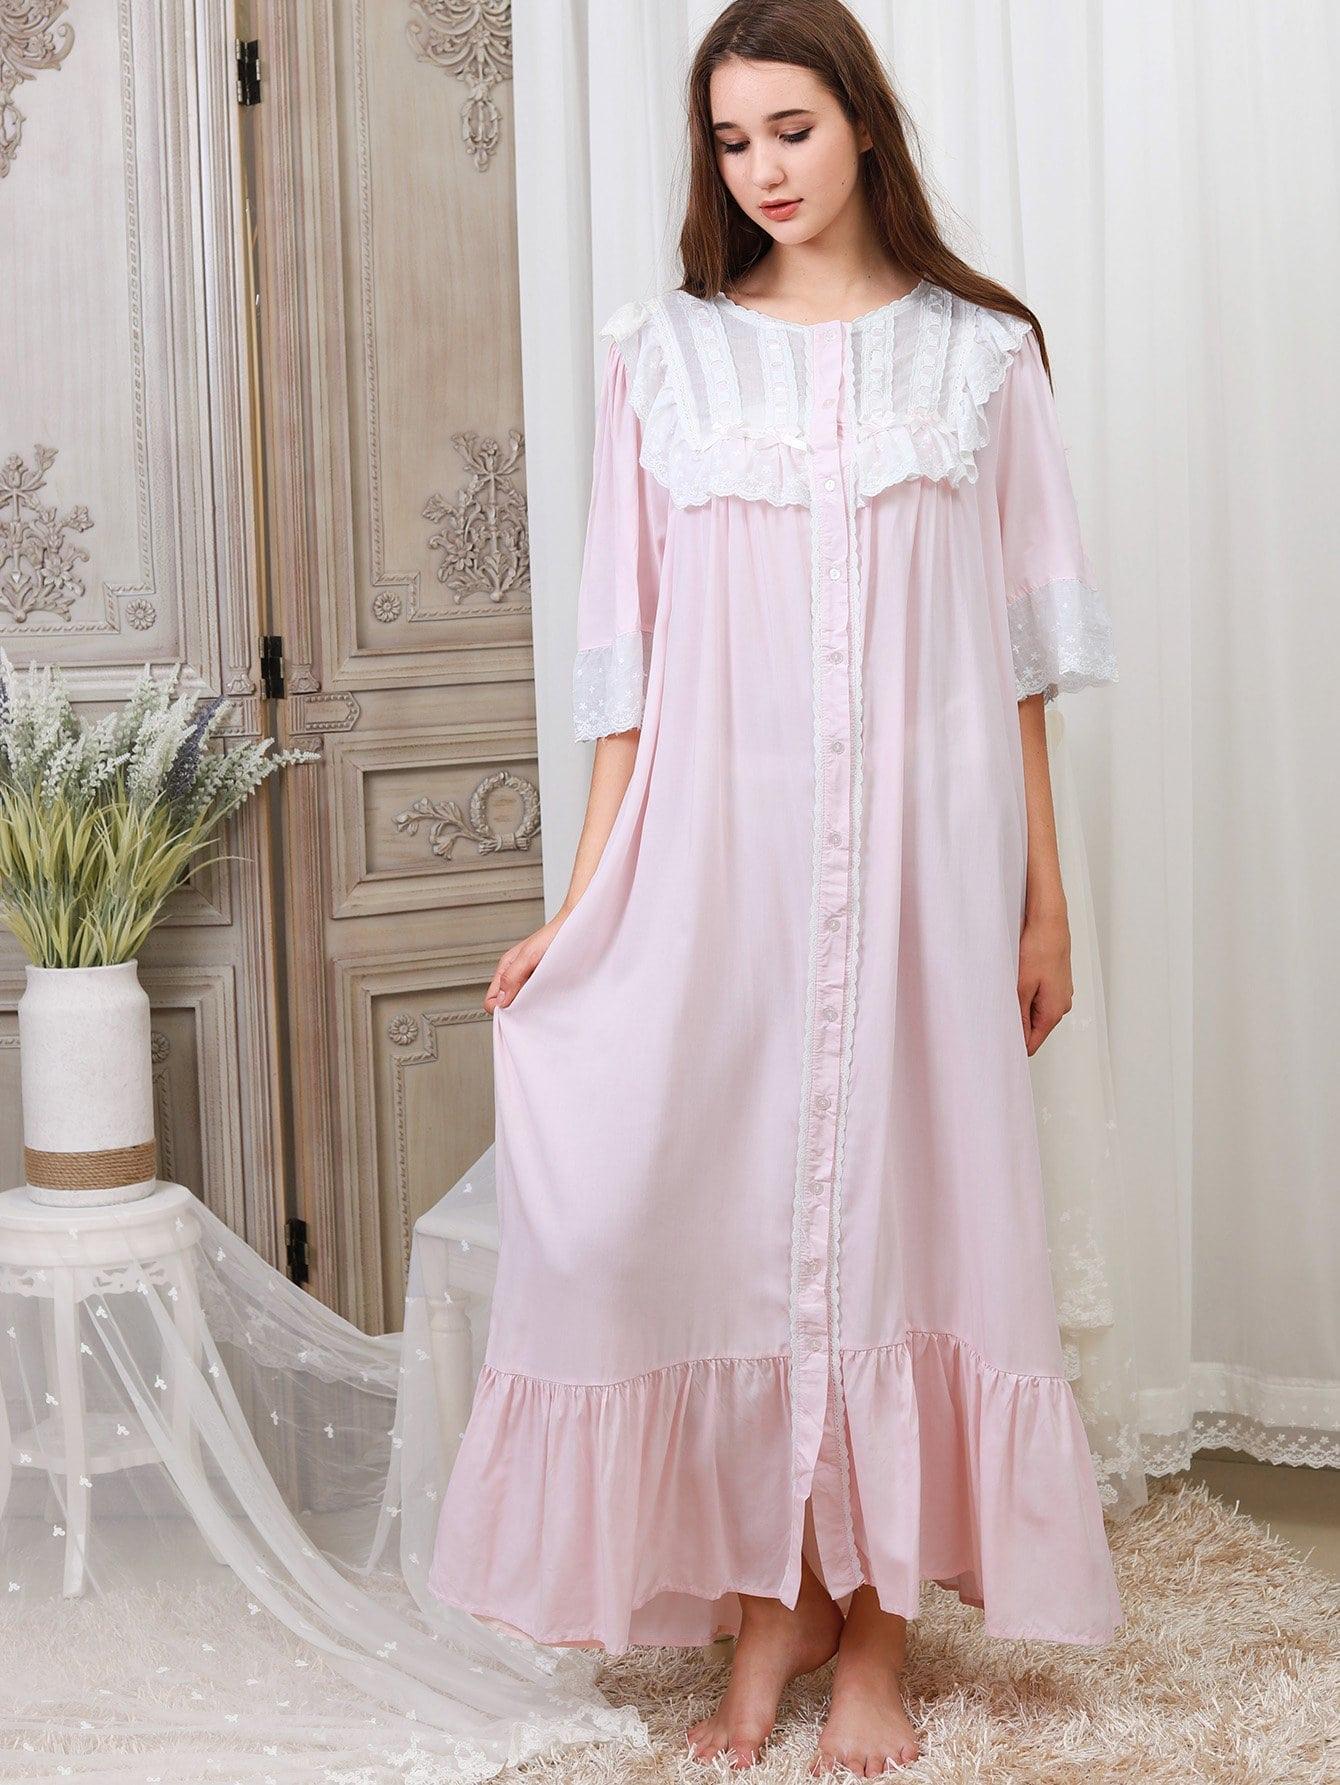 Contrast Lace Ruffle Hem Night Dress